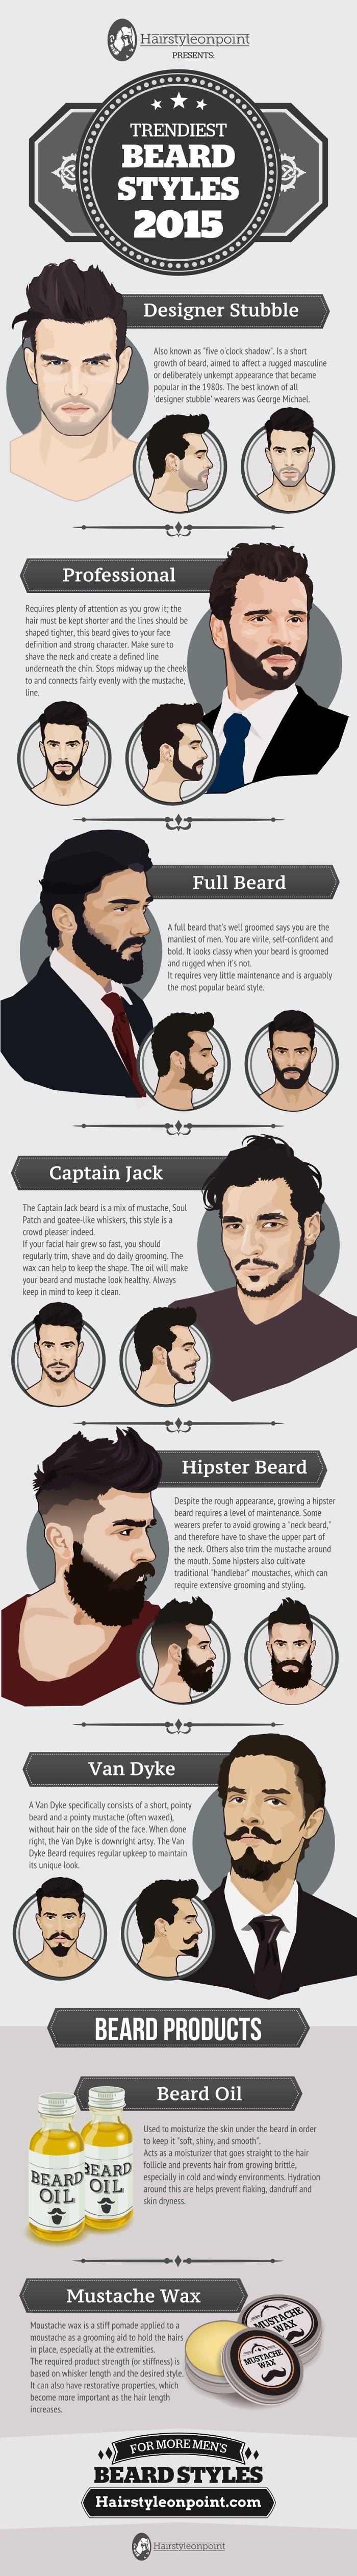 Trendiest Beard Styles 2015